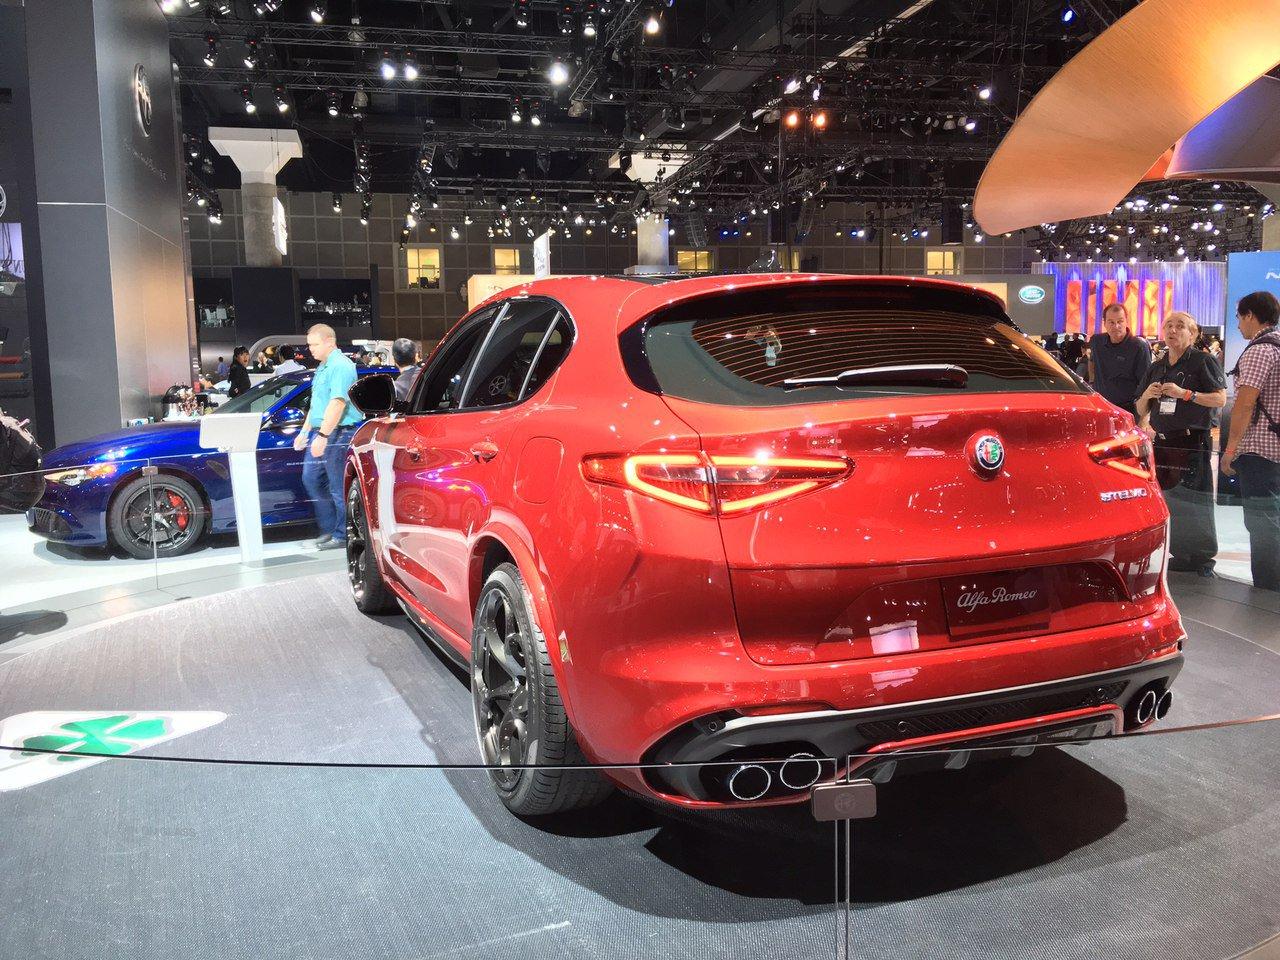 1479393101 jrl3rx exvg - Alfa Romeo представила в Лос-Анджелесе кроссовер Stelvio QV